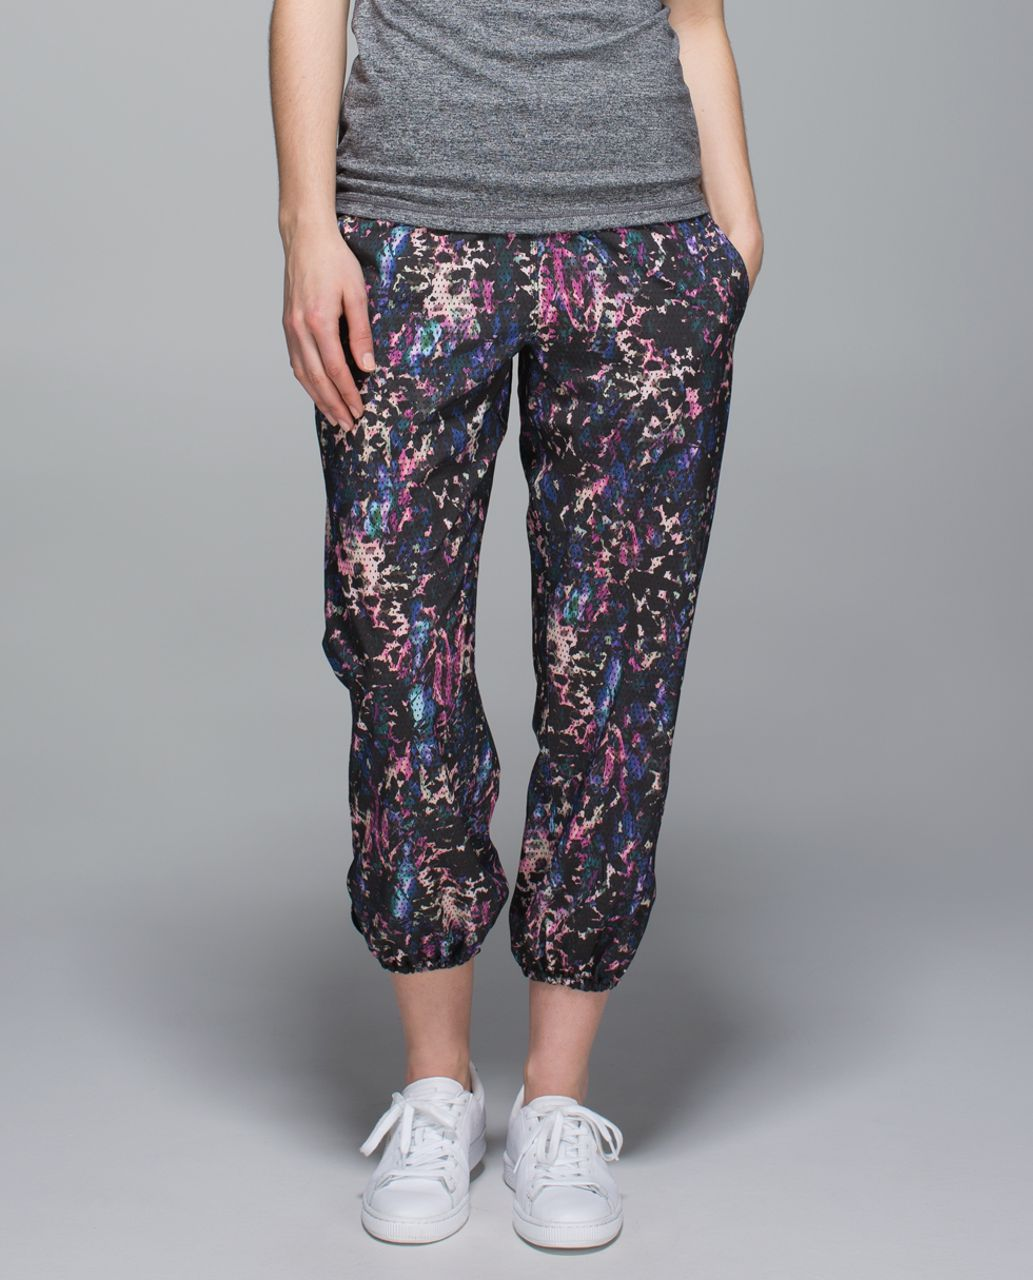 079c695a28c1b Lululemon Om Pant - Floral Sport Black Multi / Black - lulu fanatics